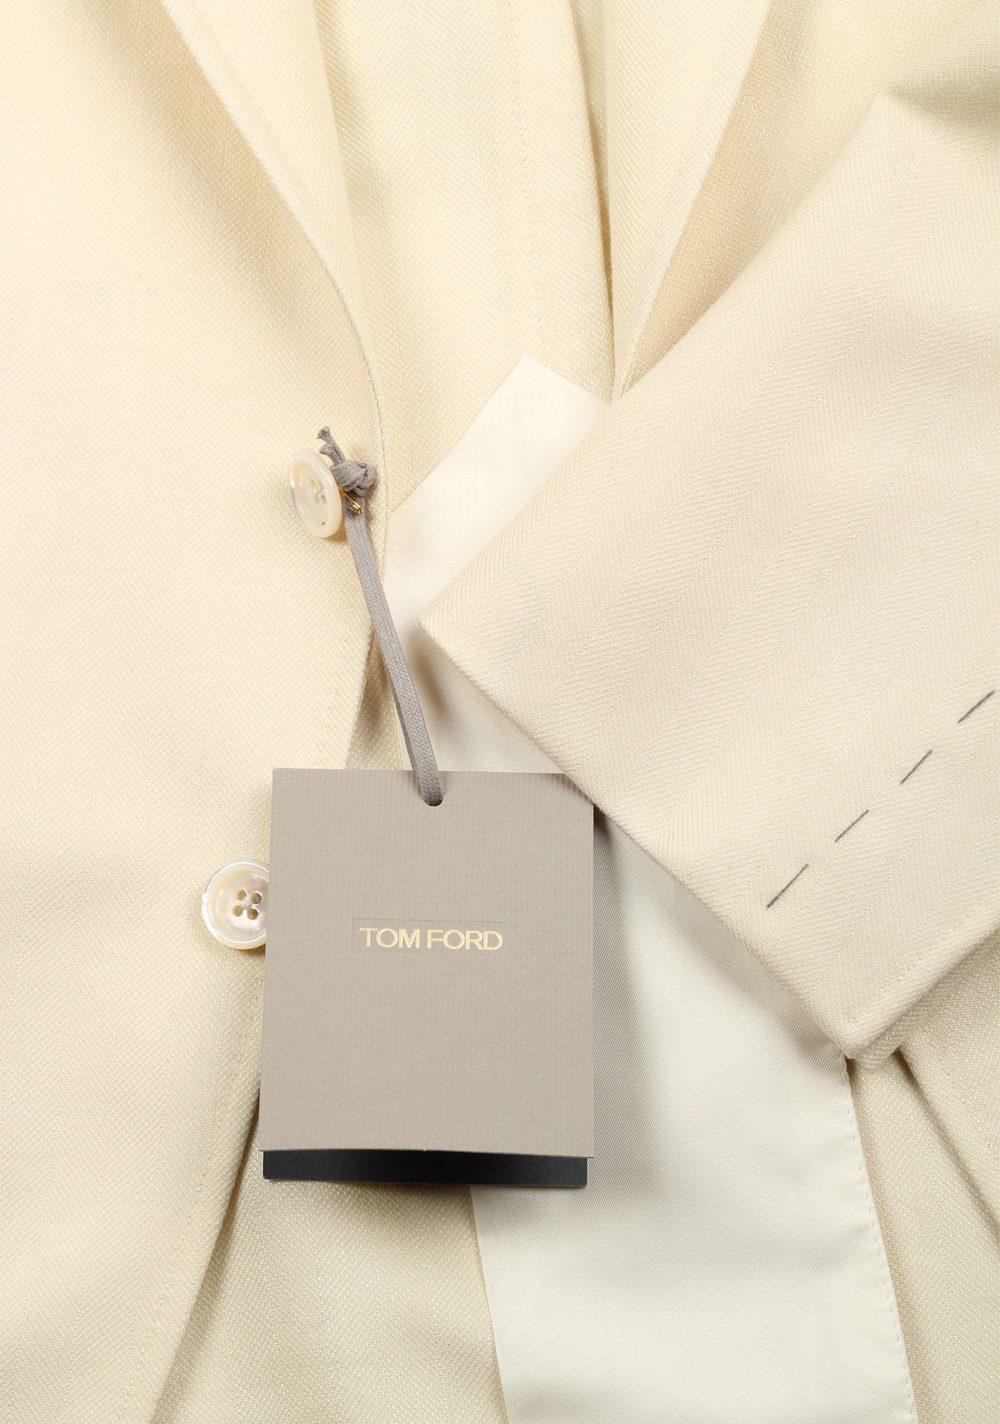 TOM FORD Shelton Off White Sport Coat Size Size 48C / 38S U.S. | Costume Limité